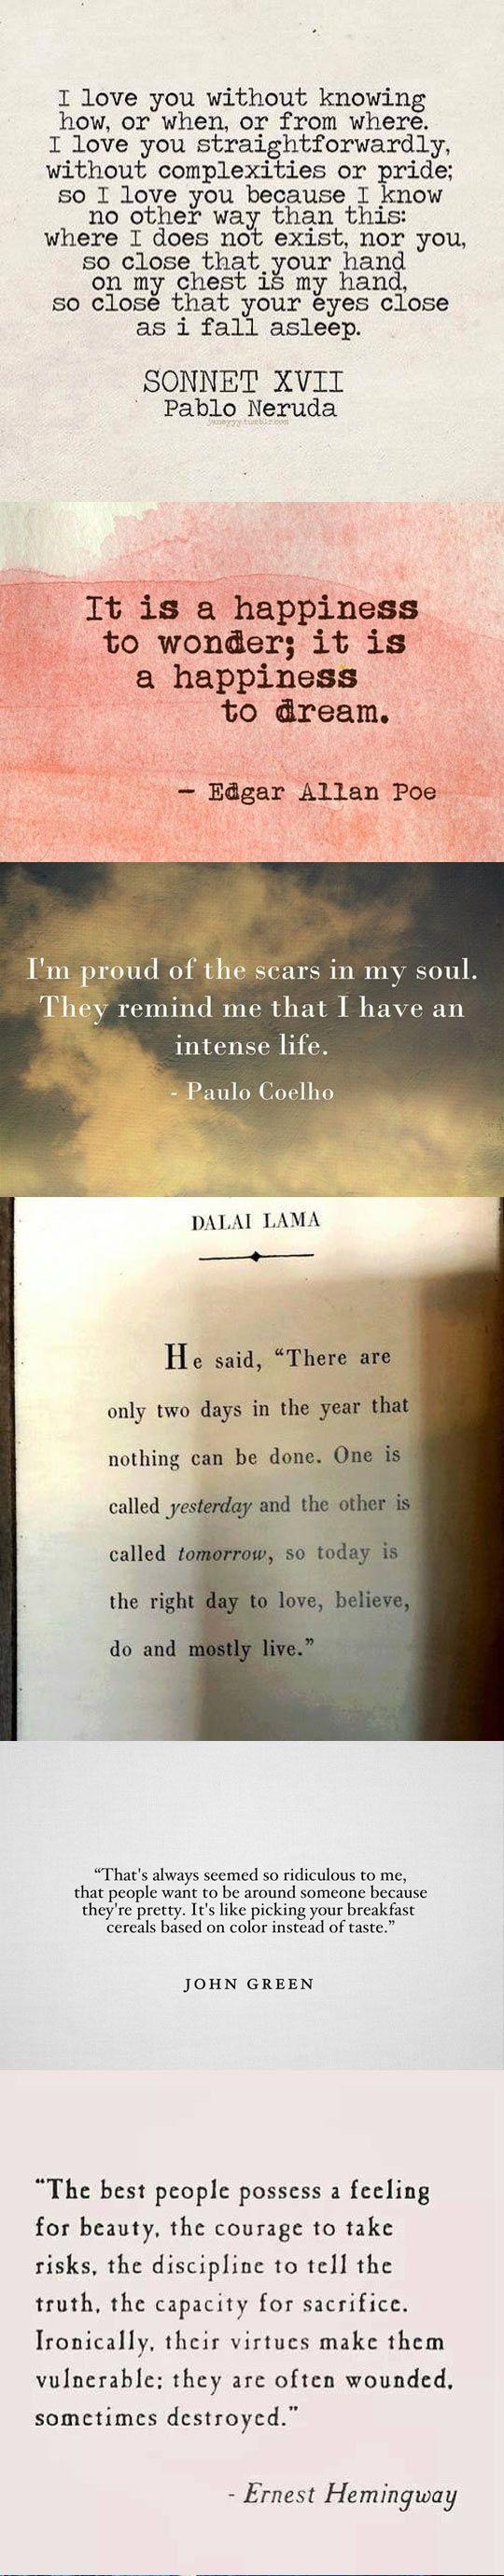 charming life pattern: pablo neruda - edgar allan poe - paulo coelho - dalai lama - john green - ernest hemingway - quotes ...